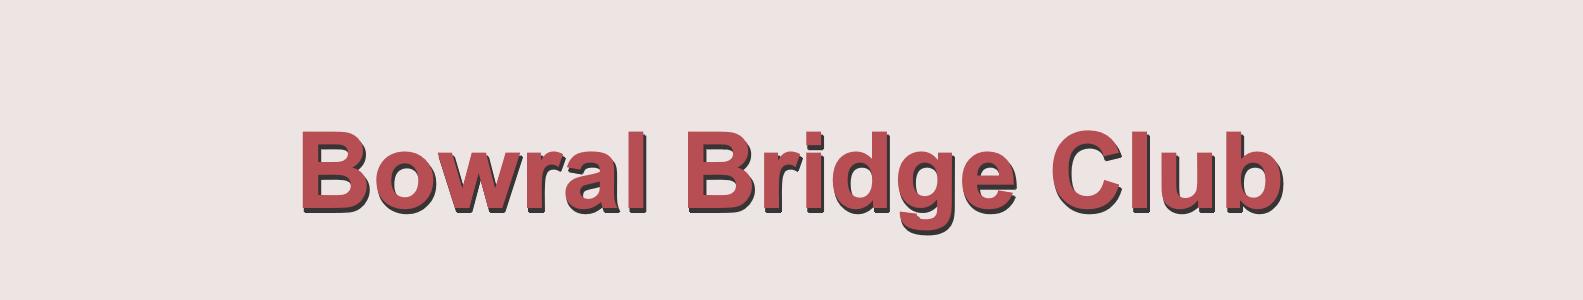 How to Enter Bowral Bridge Club Games